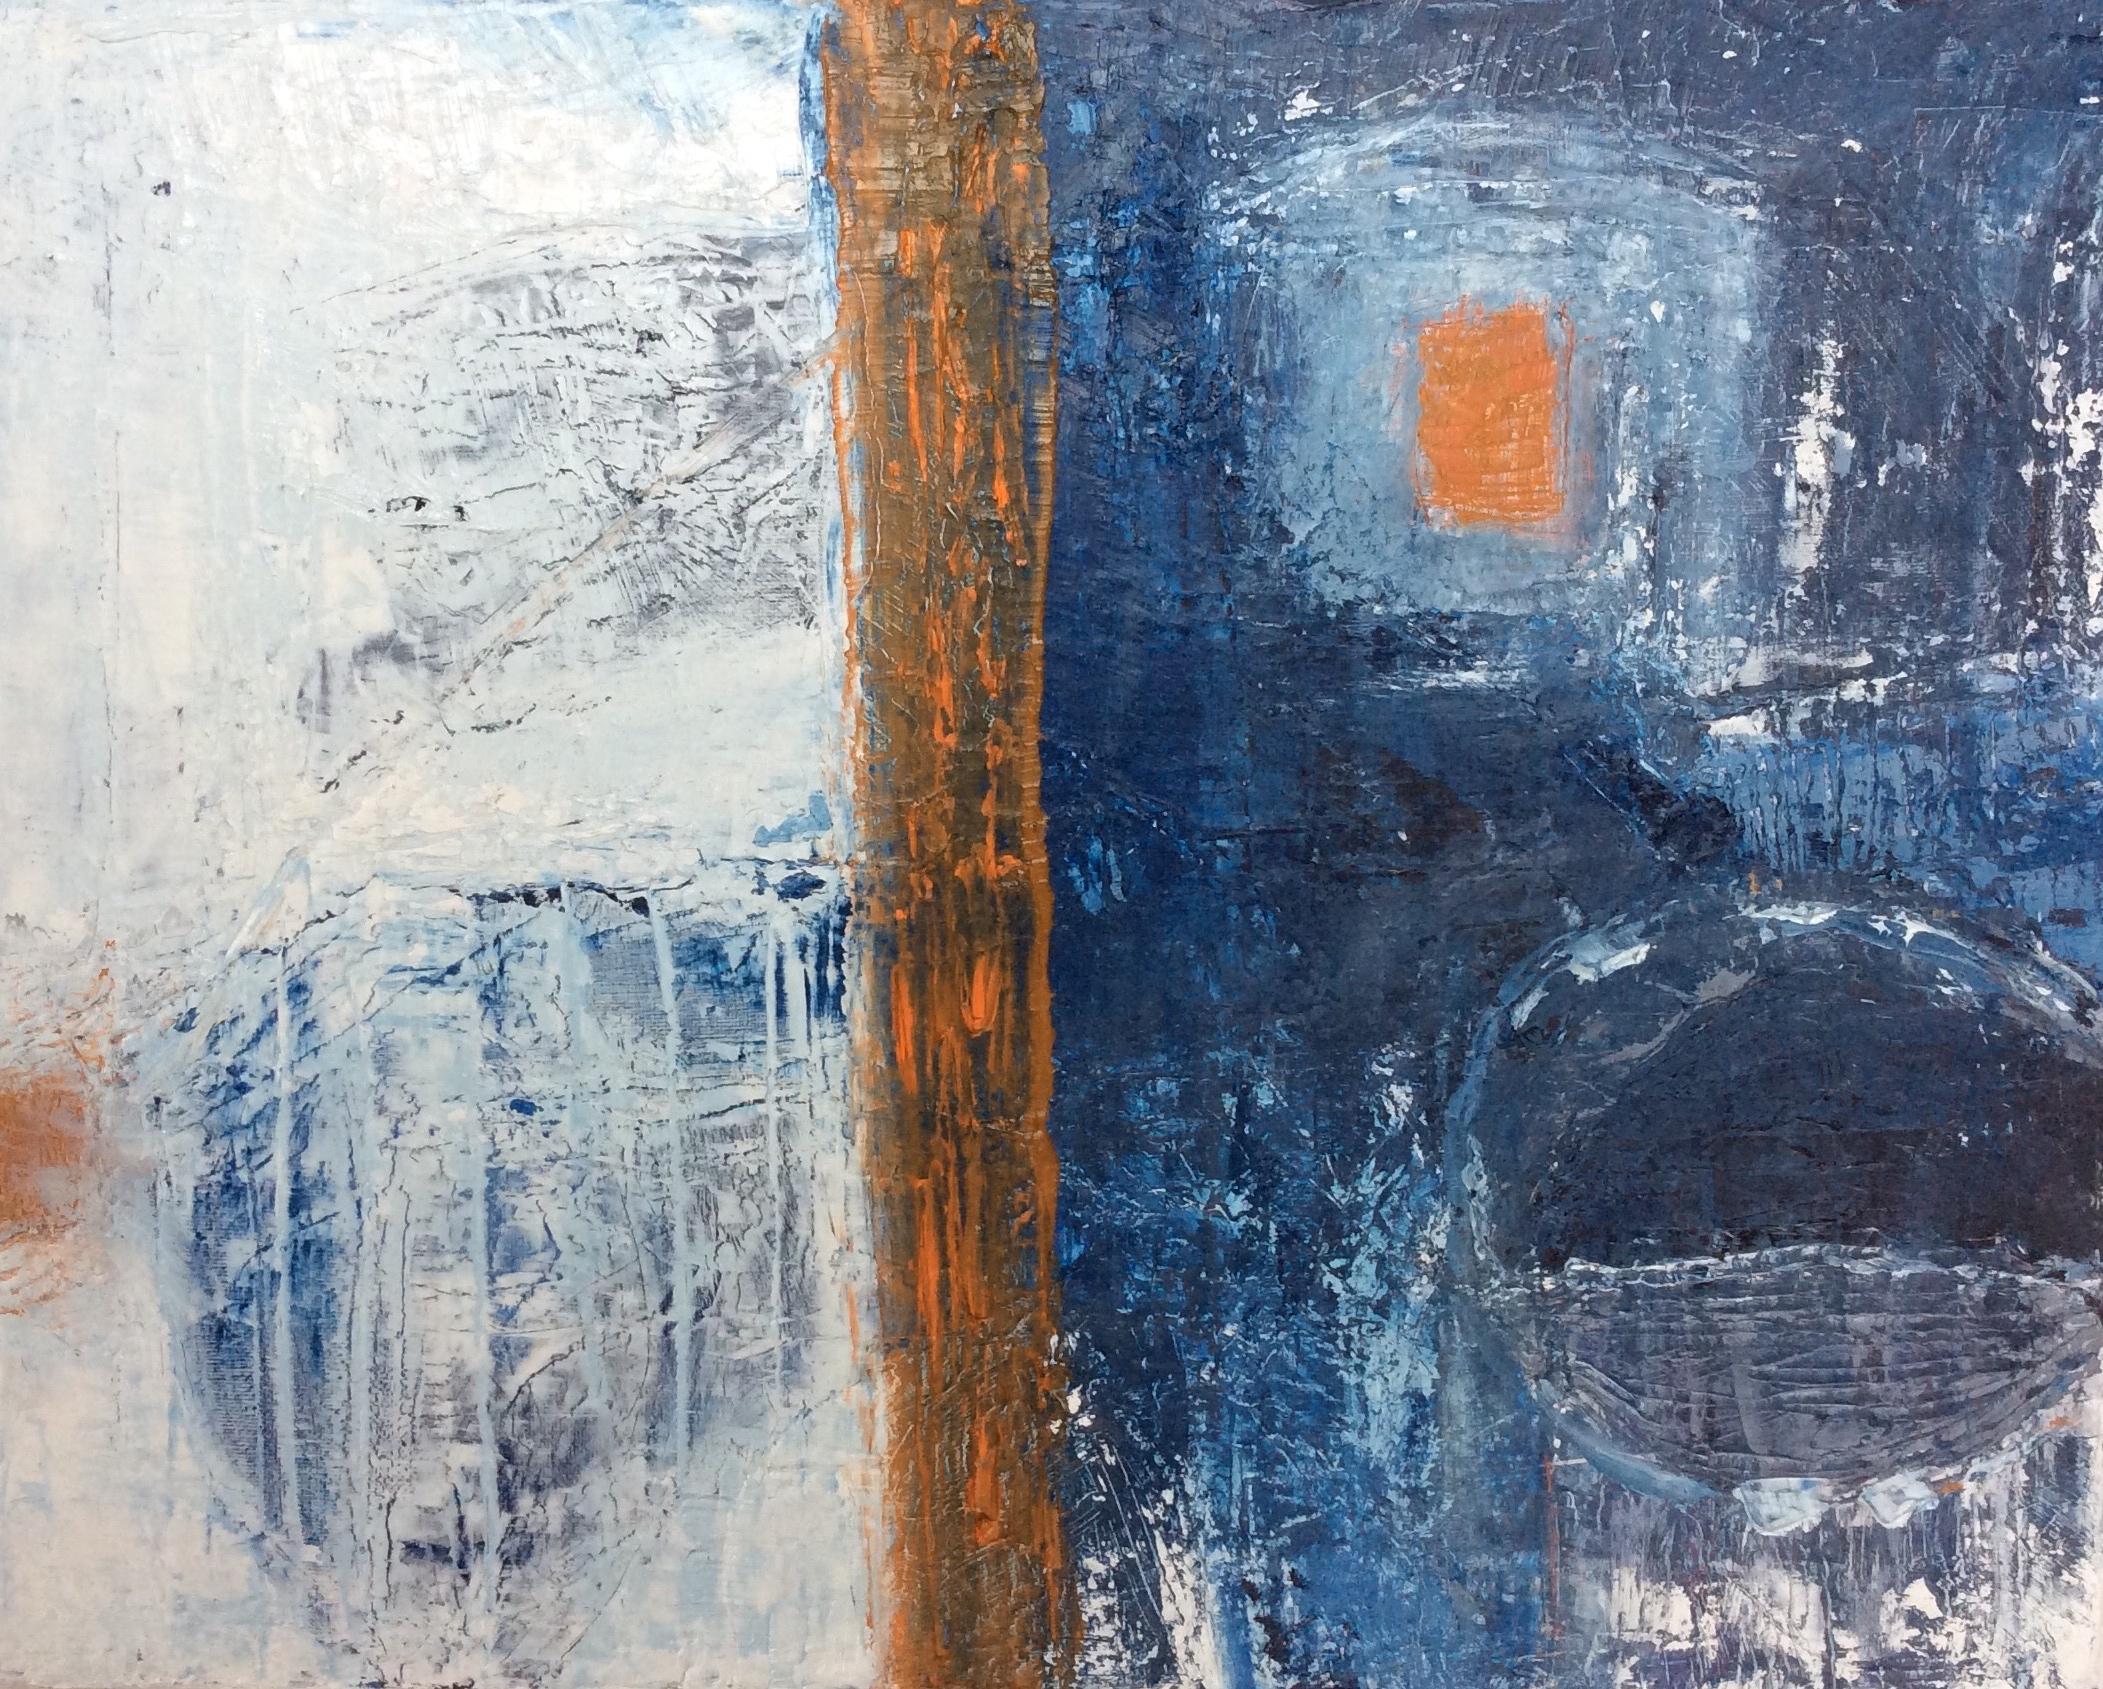 Blue and Orange Harbour